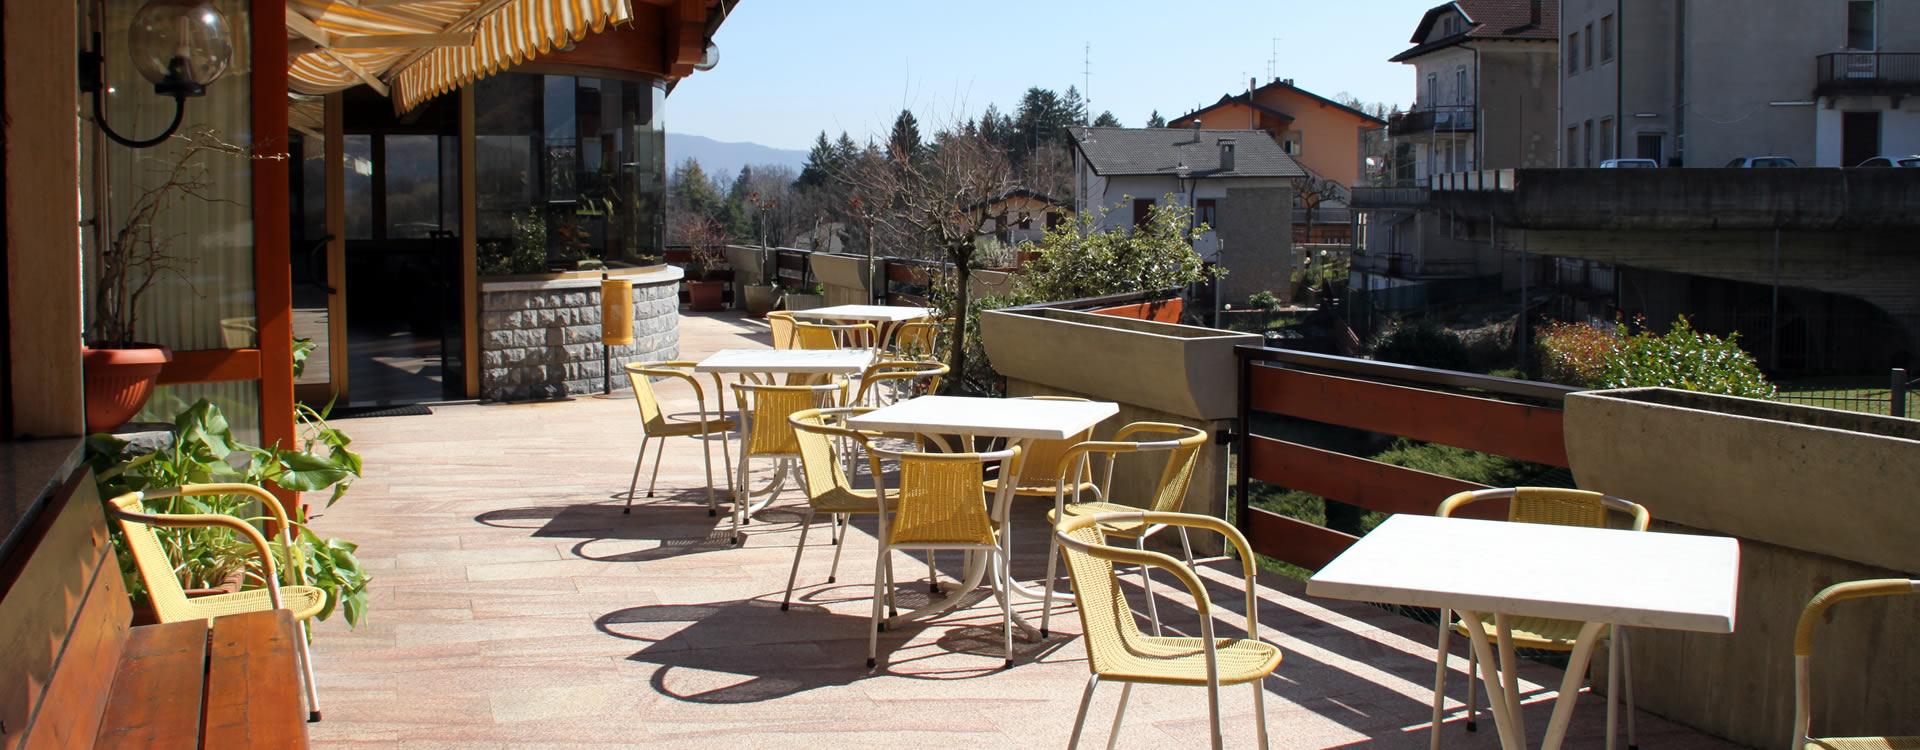 hotel_valle_imagna_03